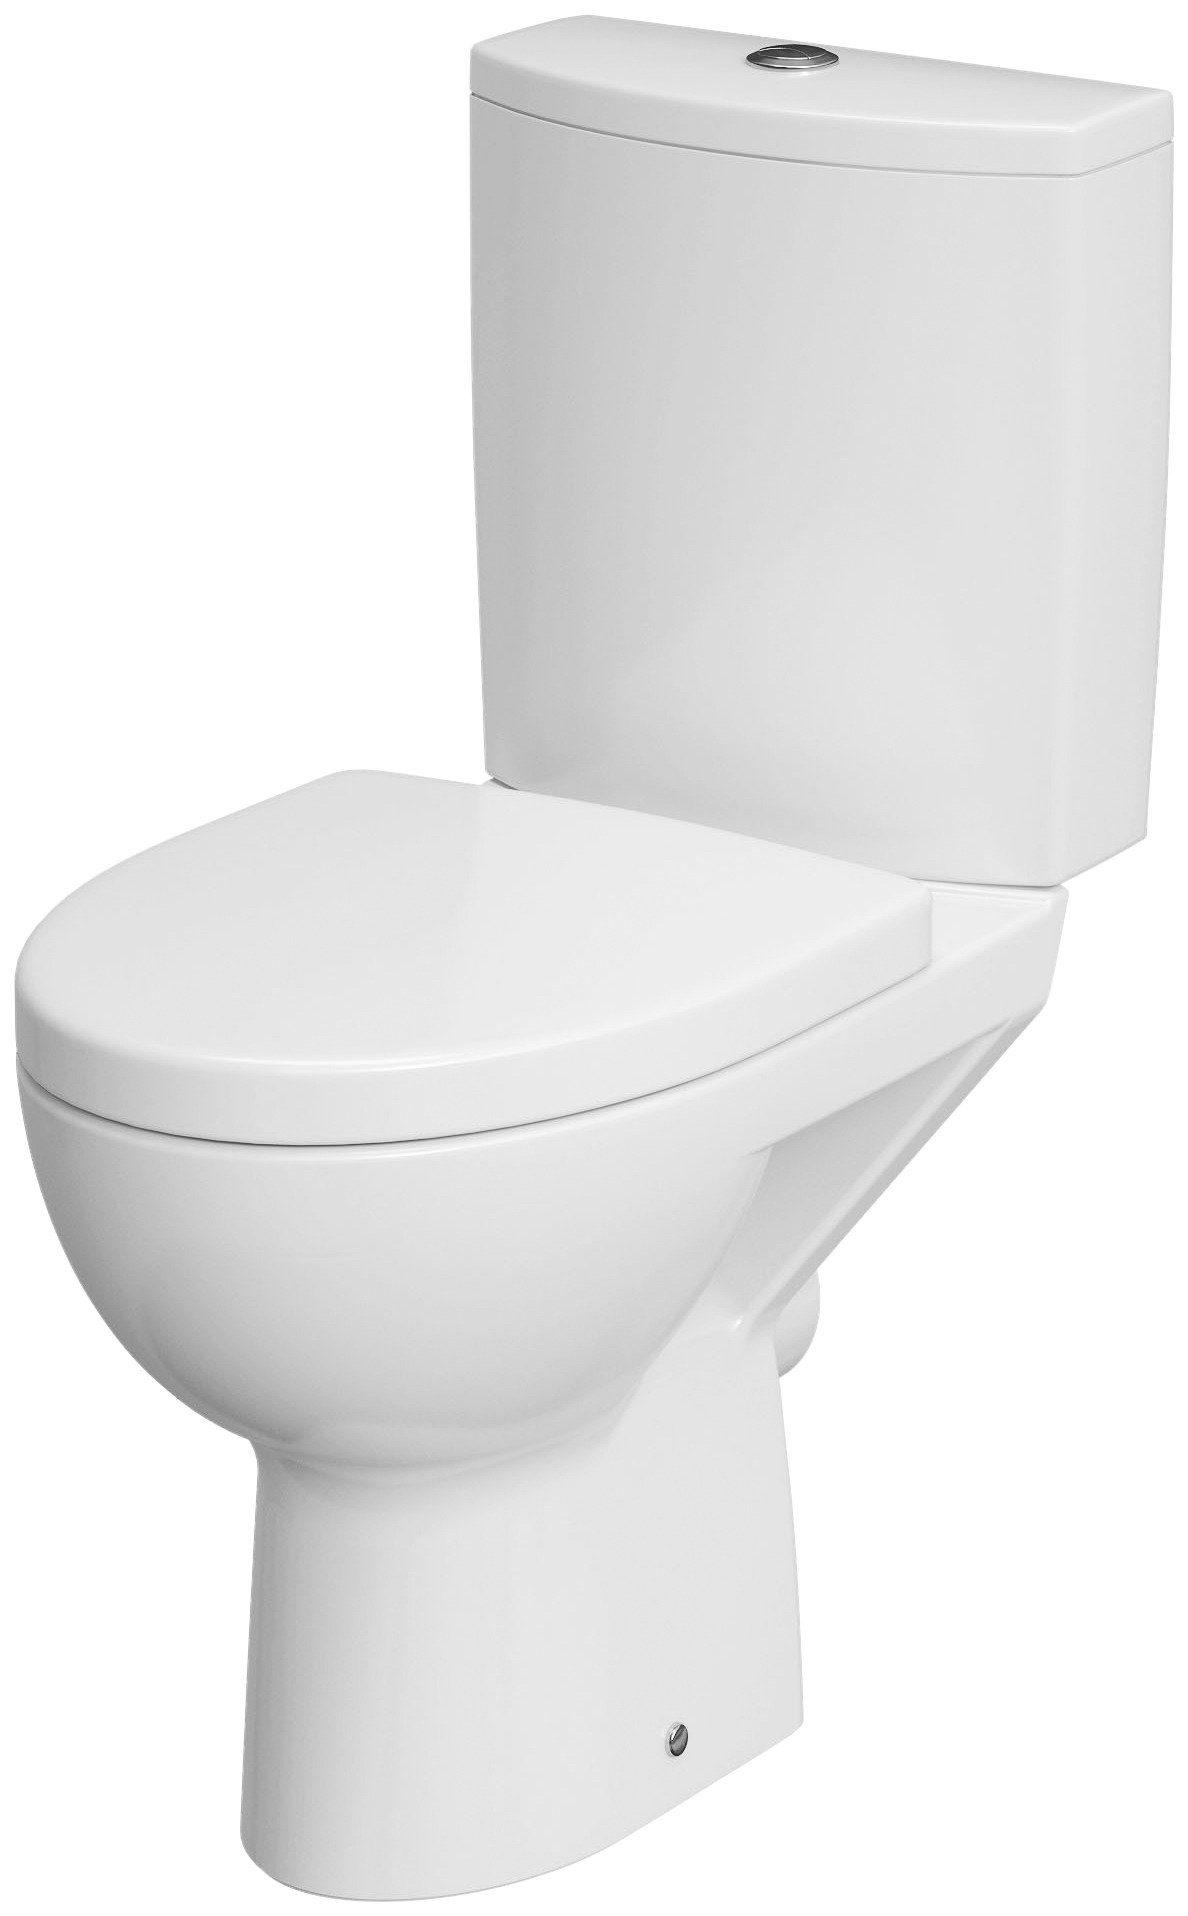 Komplett-Set: Stand WC »Montego spülrandlos«